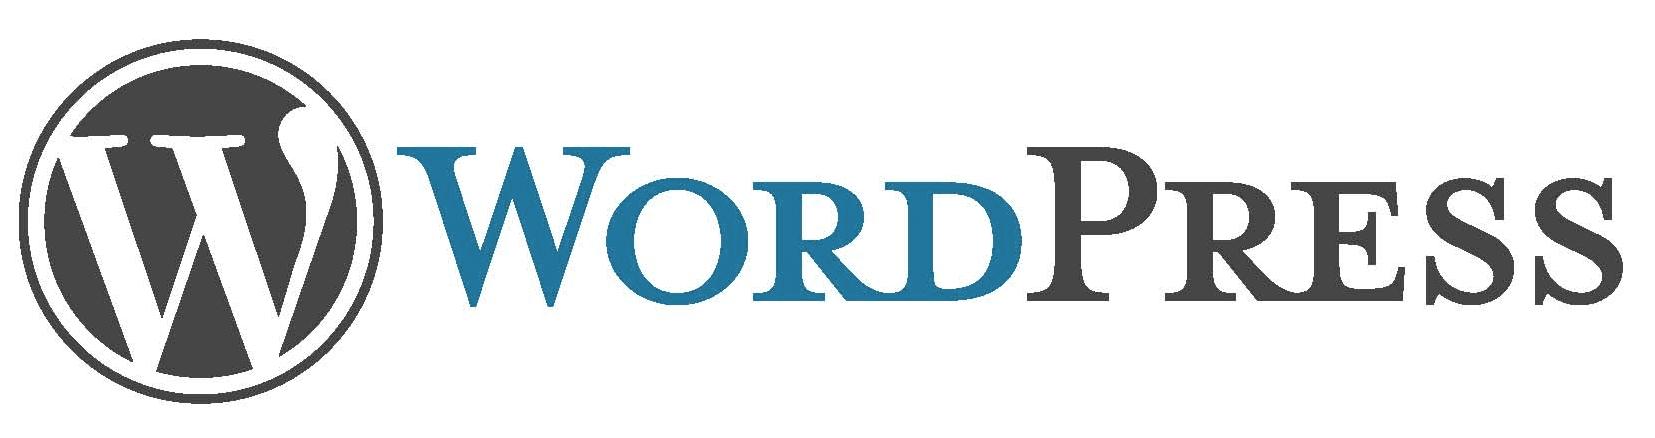 wordpress horizontal